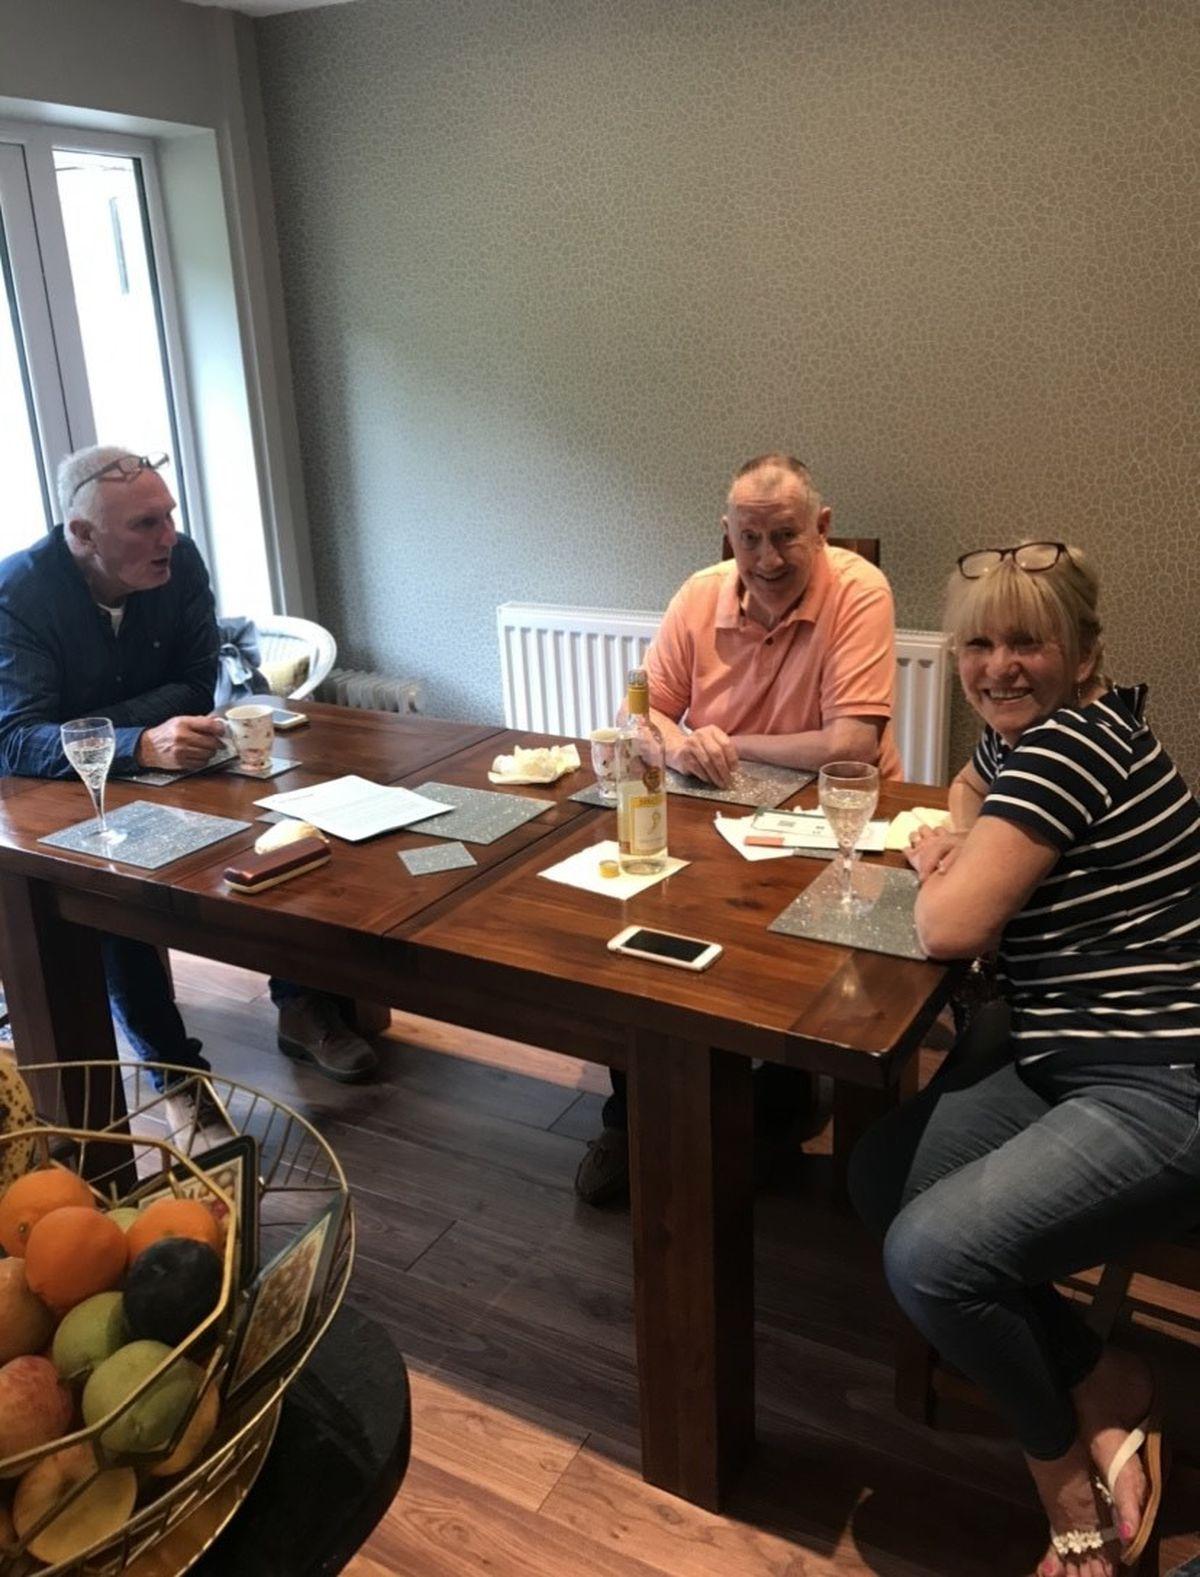 (L-R): Roger Jones, Stuart Chapman and Vicky Chapman